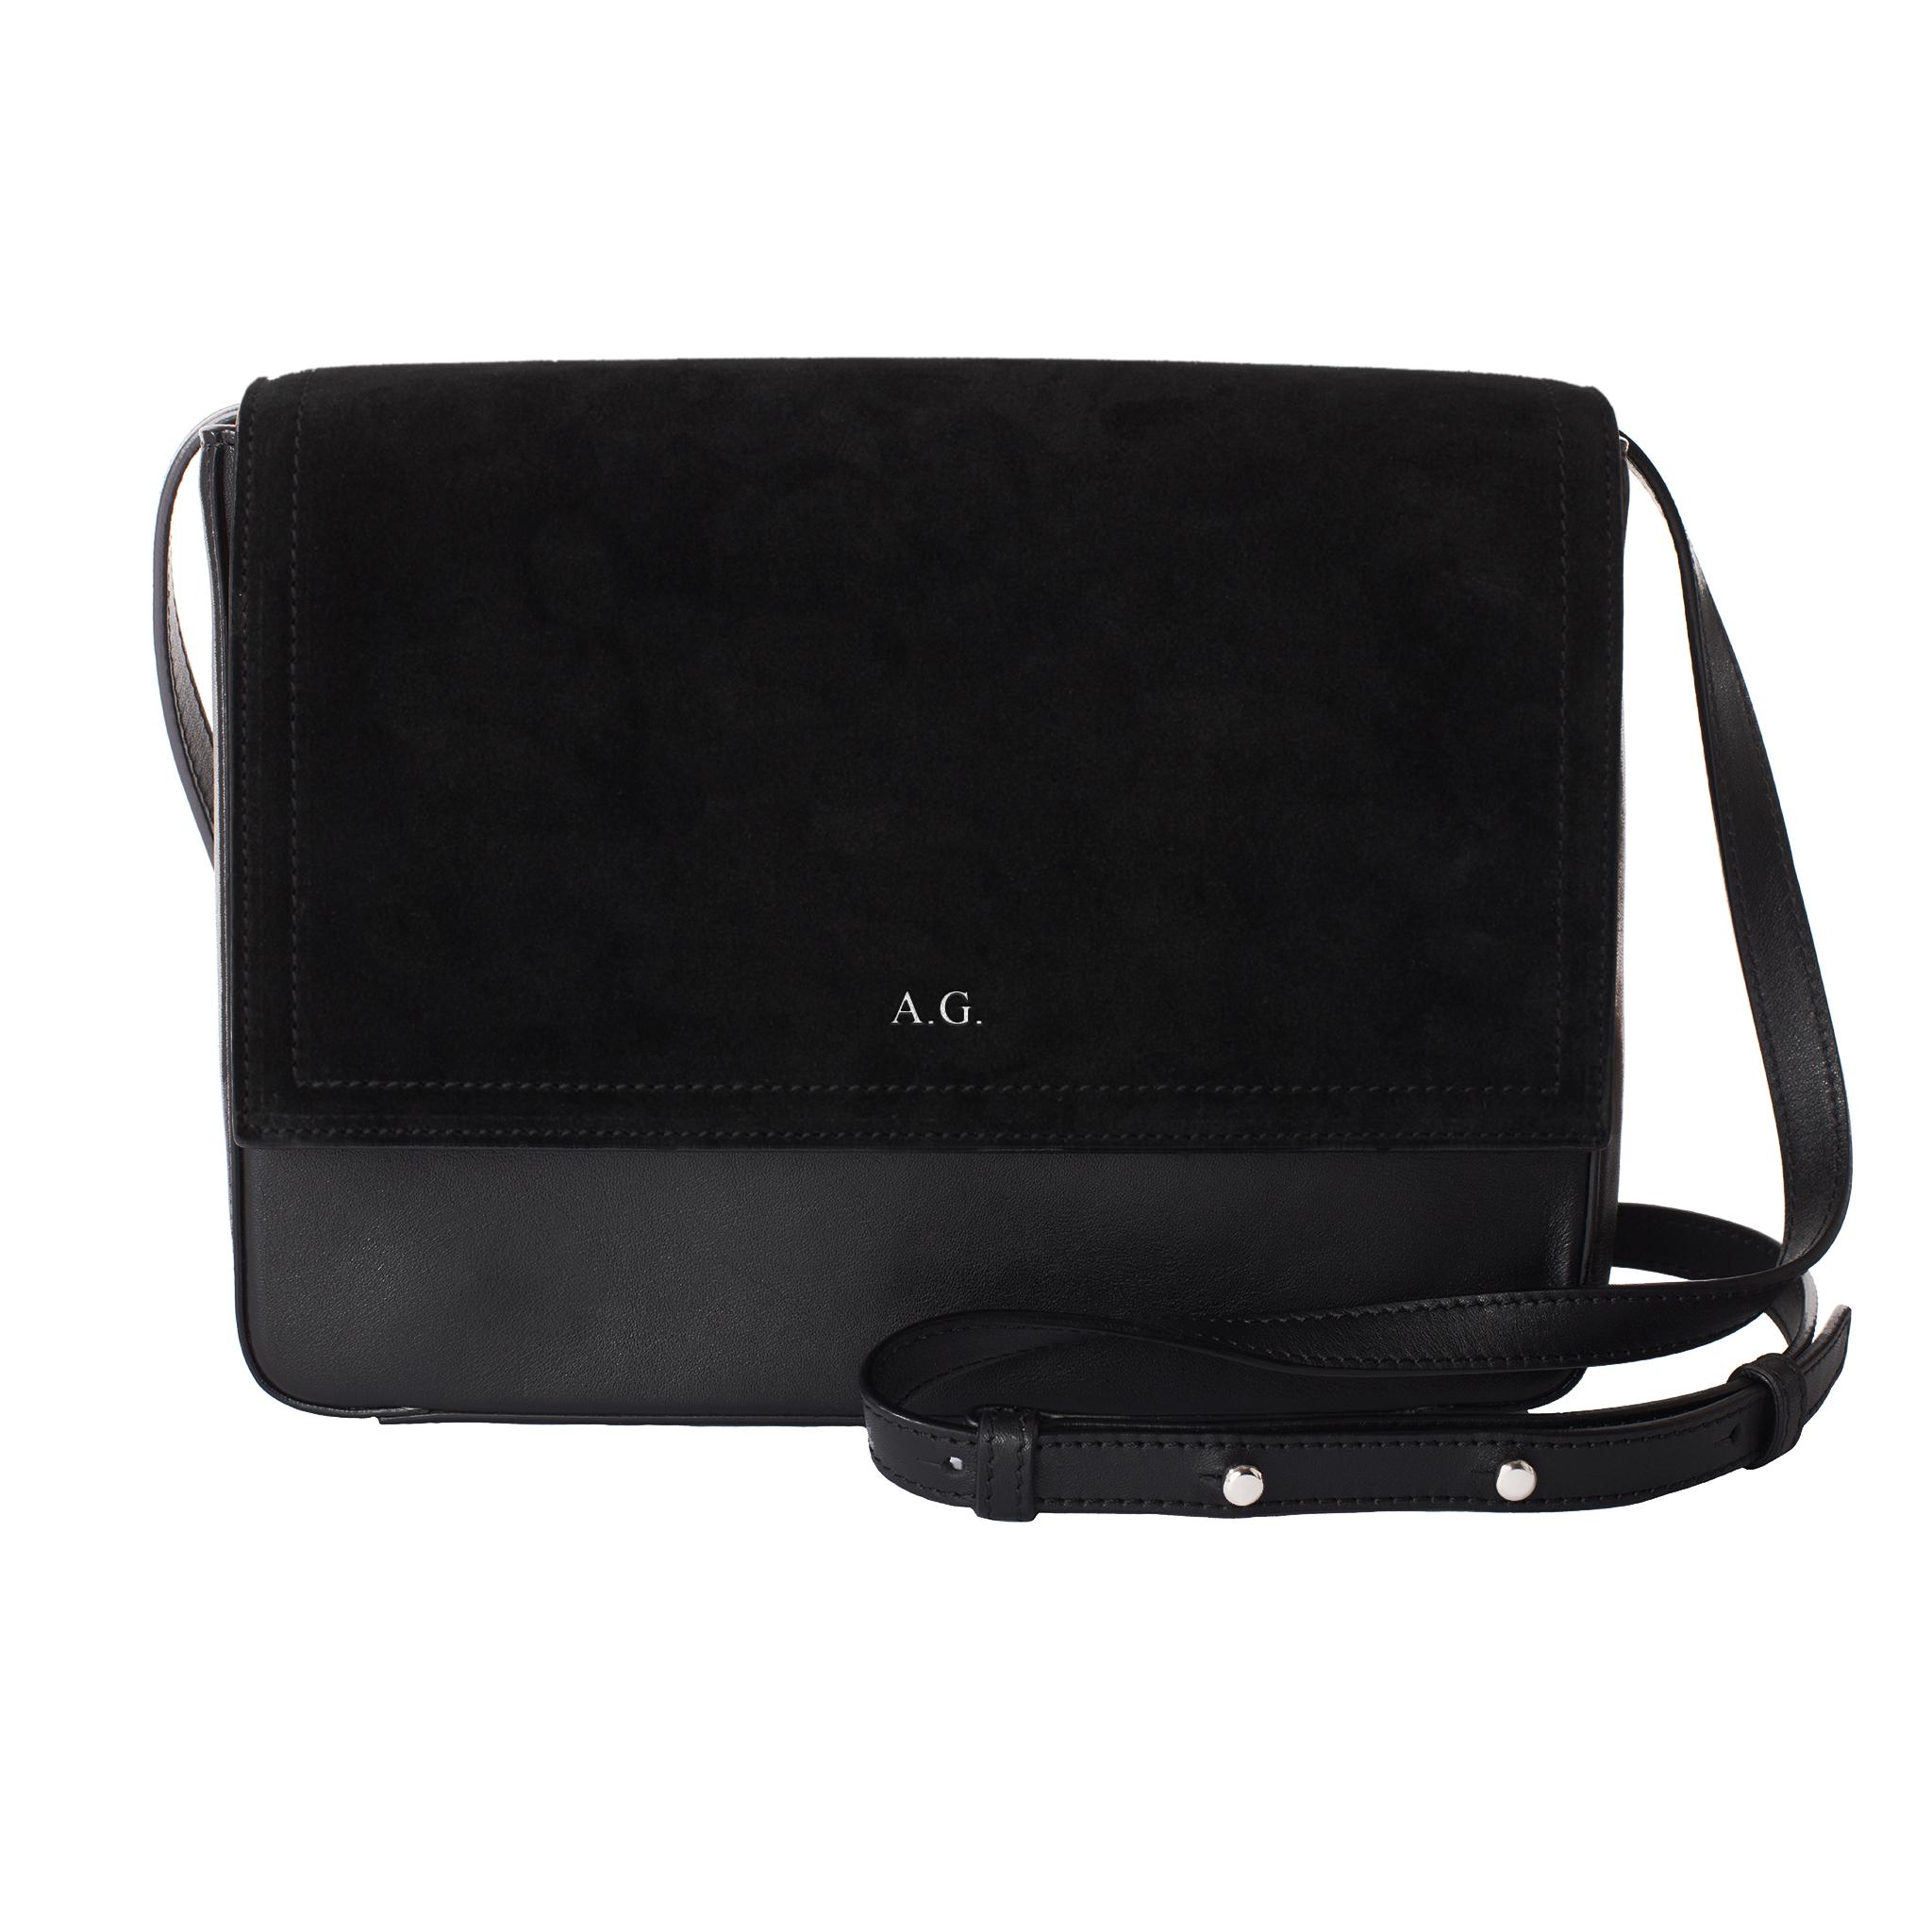 1420bca27d1 MERSOR - Personalized Crossbody Bag - Black   Silver   FASHION STYLE FAN